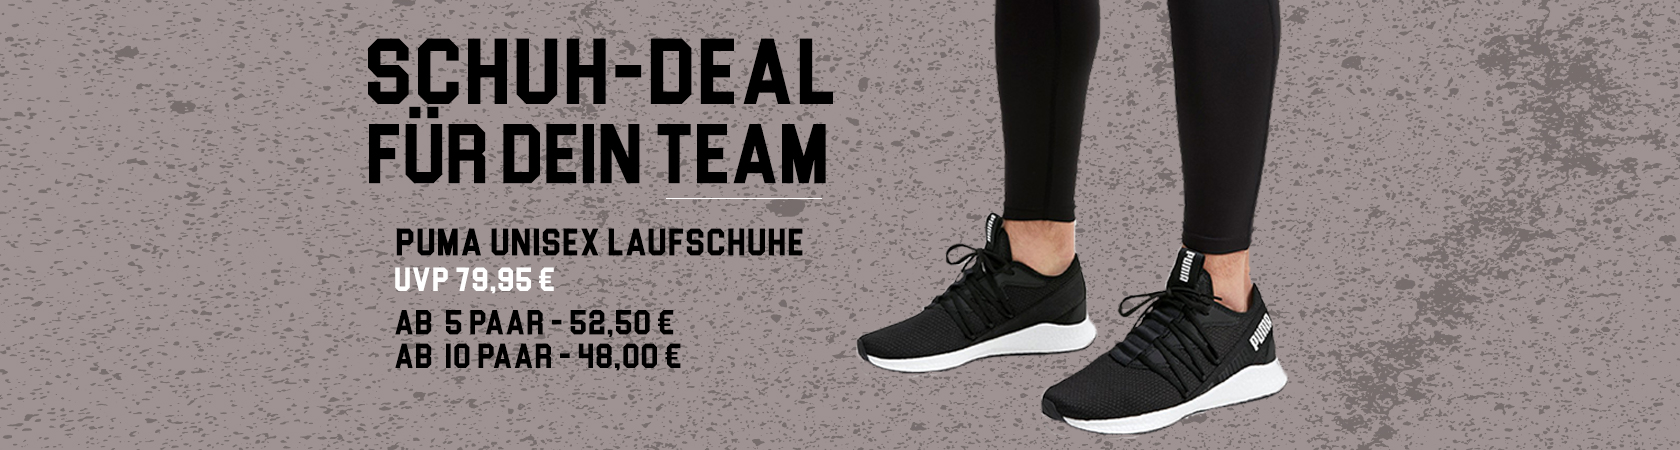 1680x450_Schuh-Deal_Puma